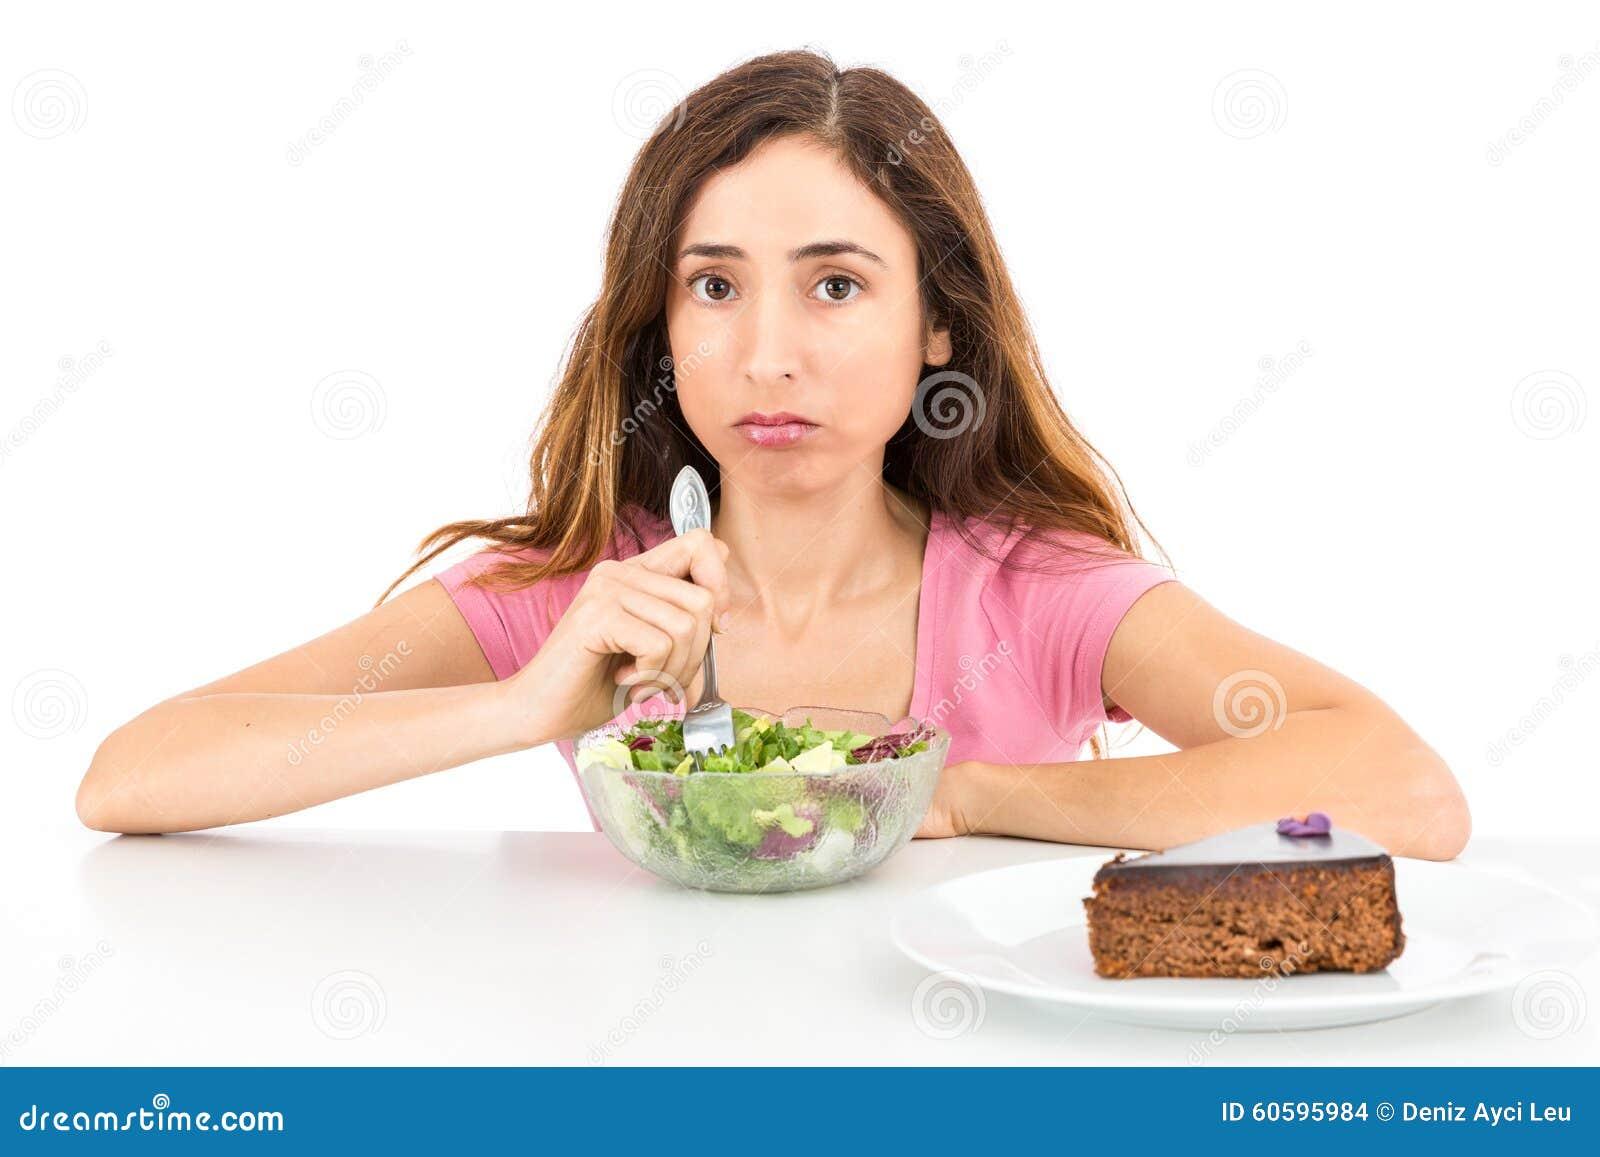 Fatty liver weight loss diet